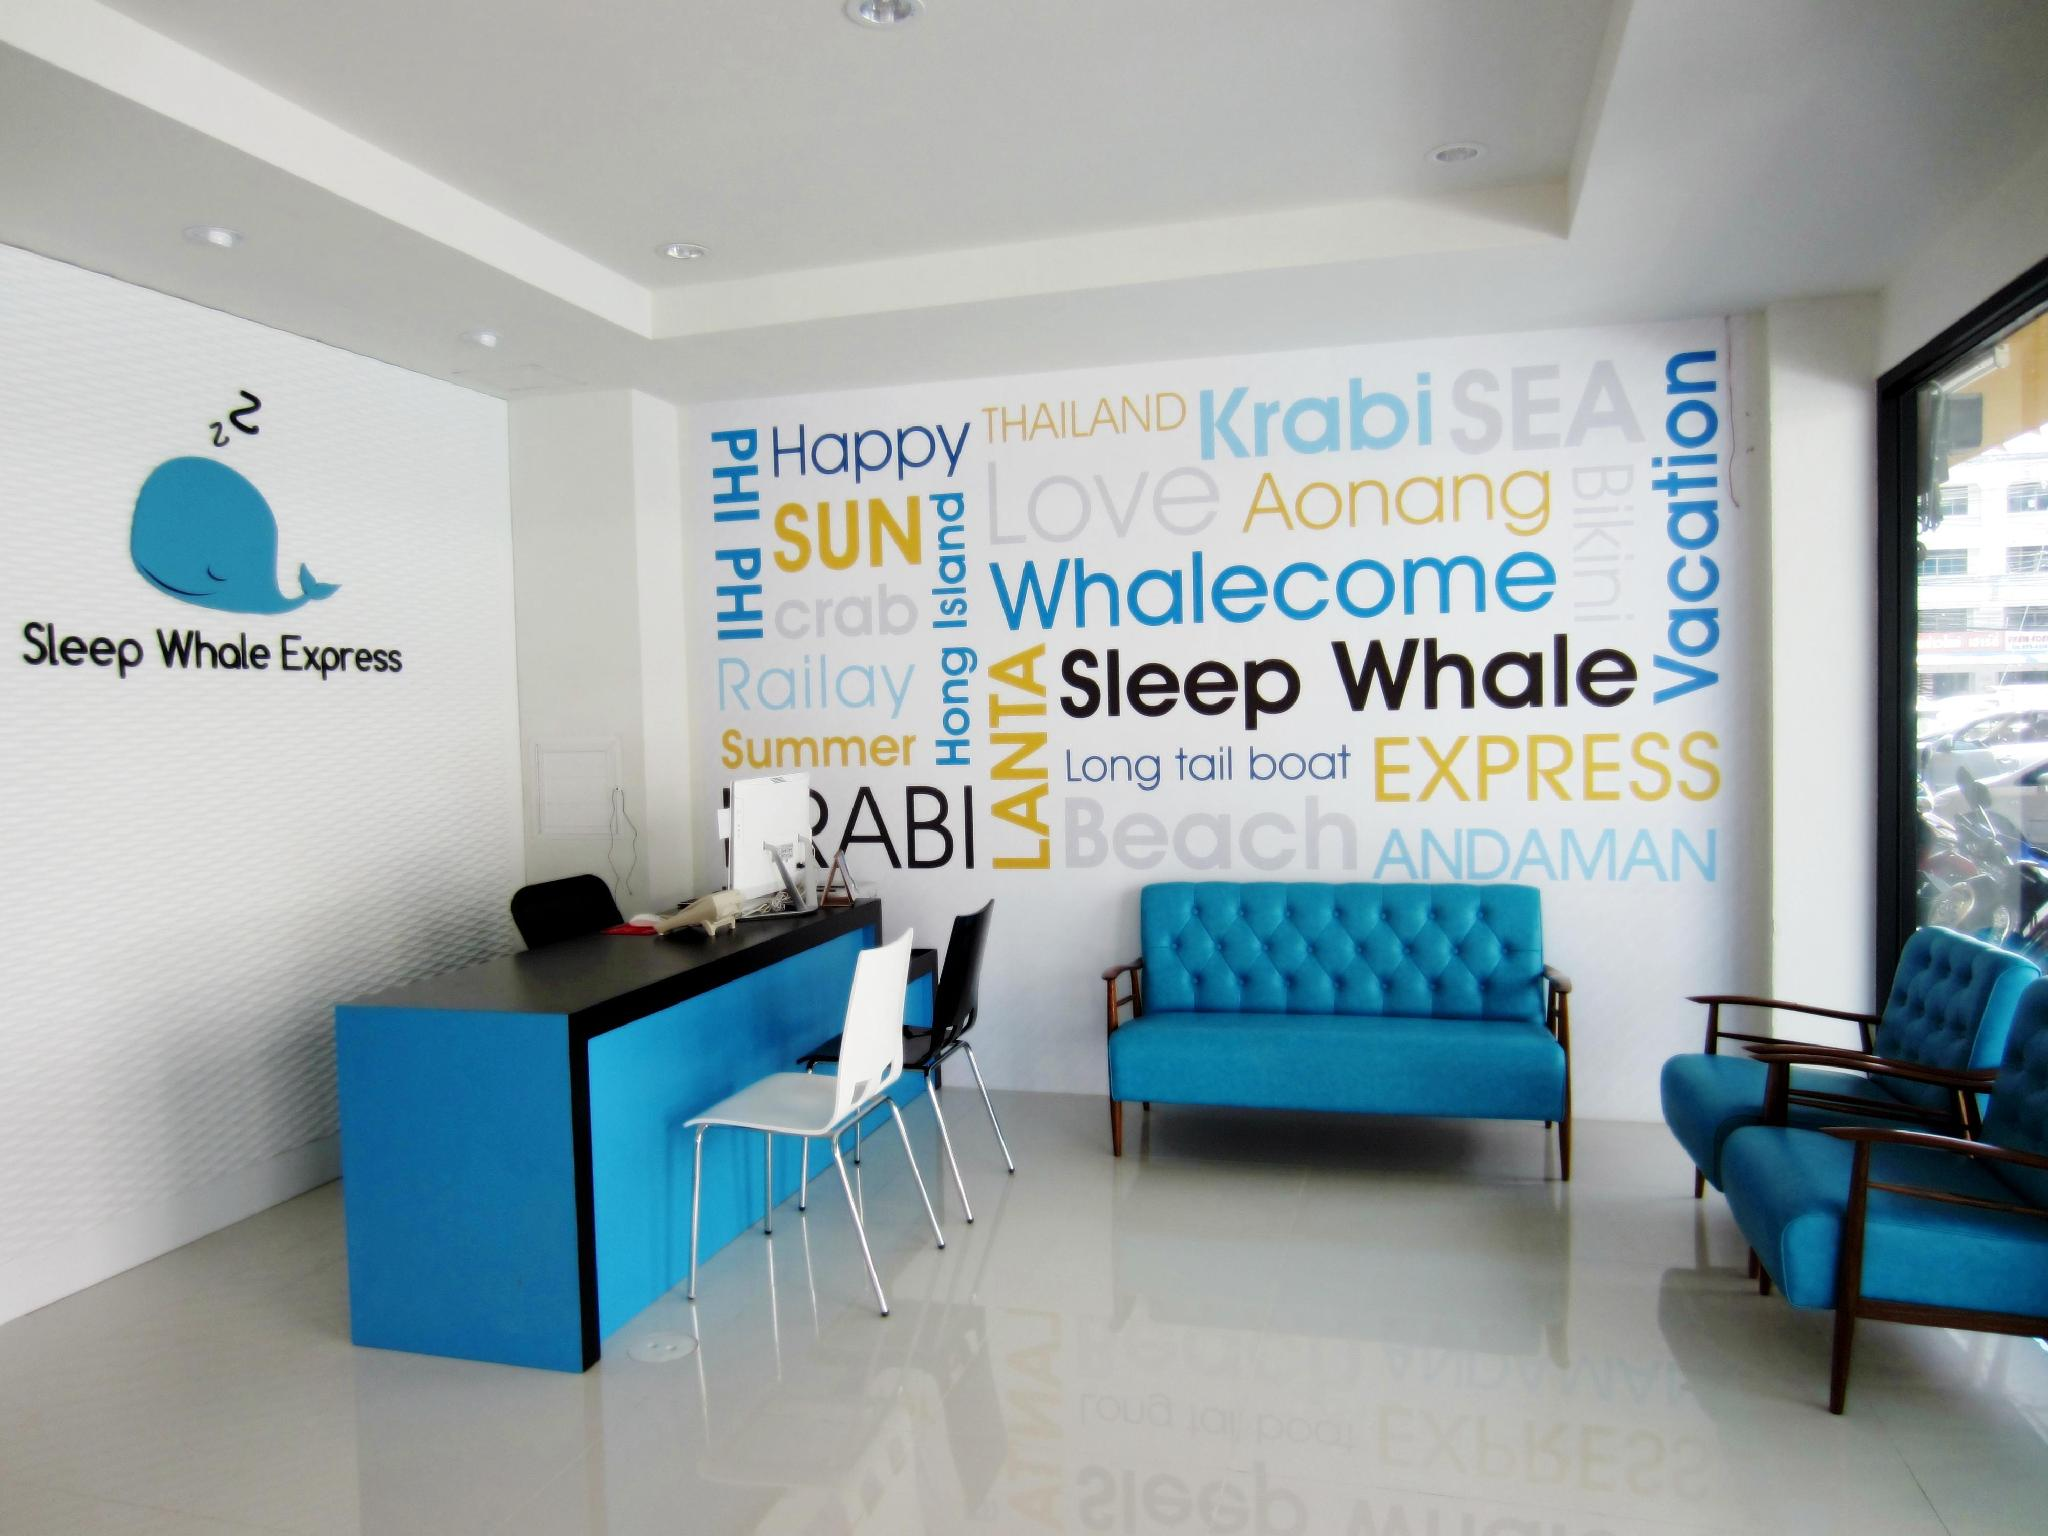 Sleep Whale Express Hotel